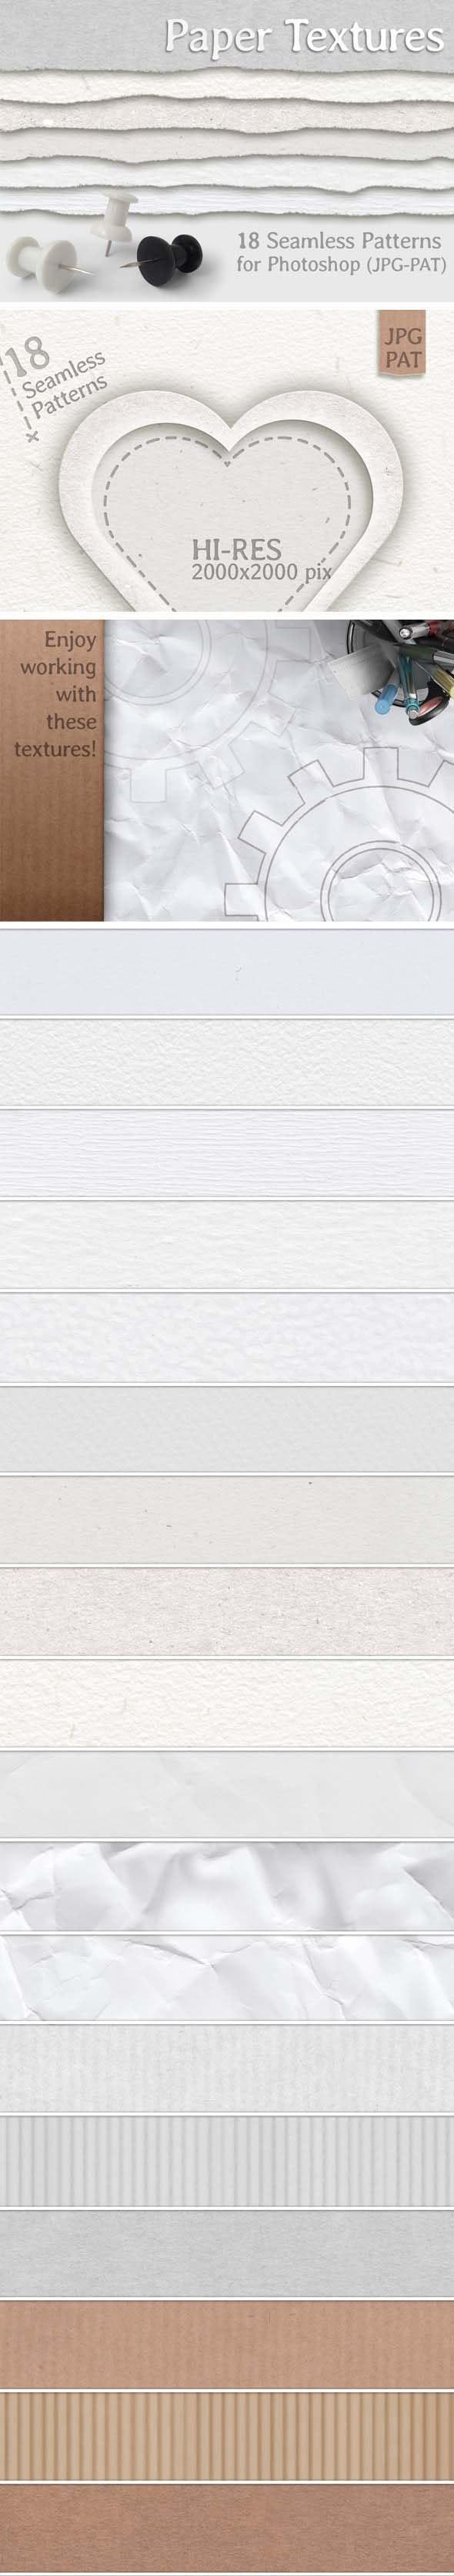 Paper Textures - Miscellaneous Textures / Fills / Patterns